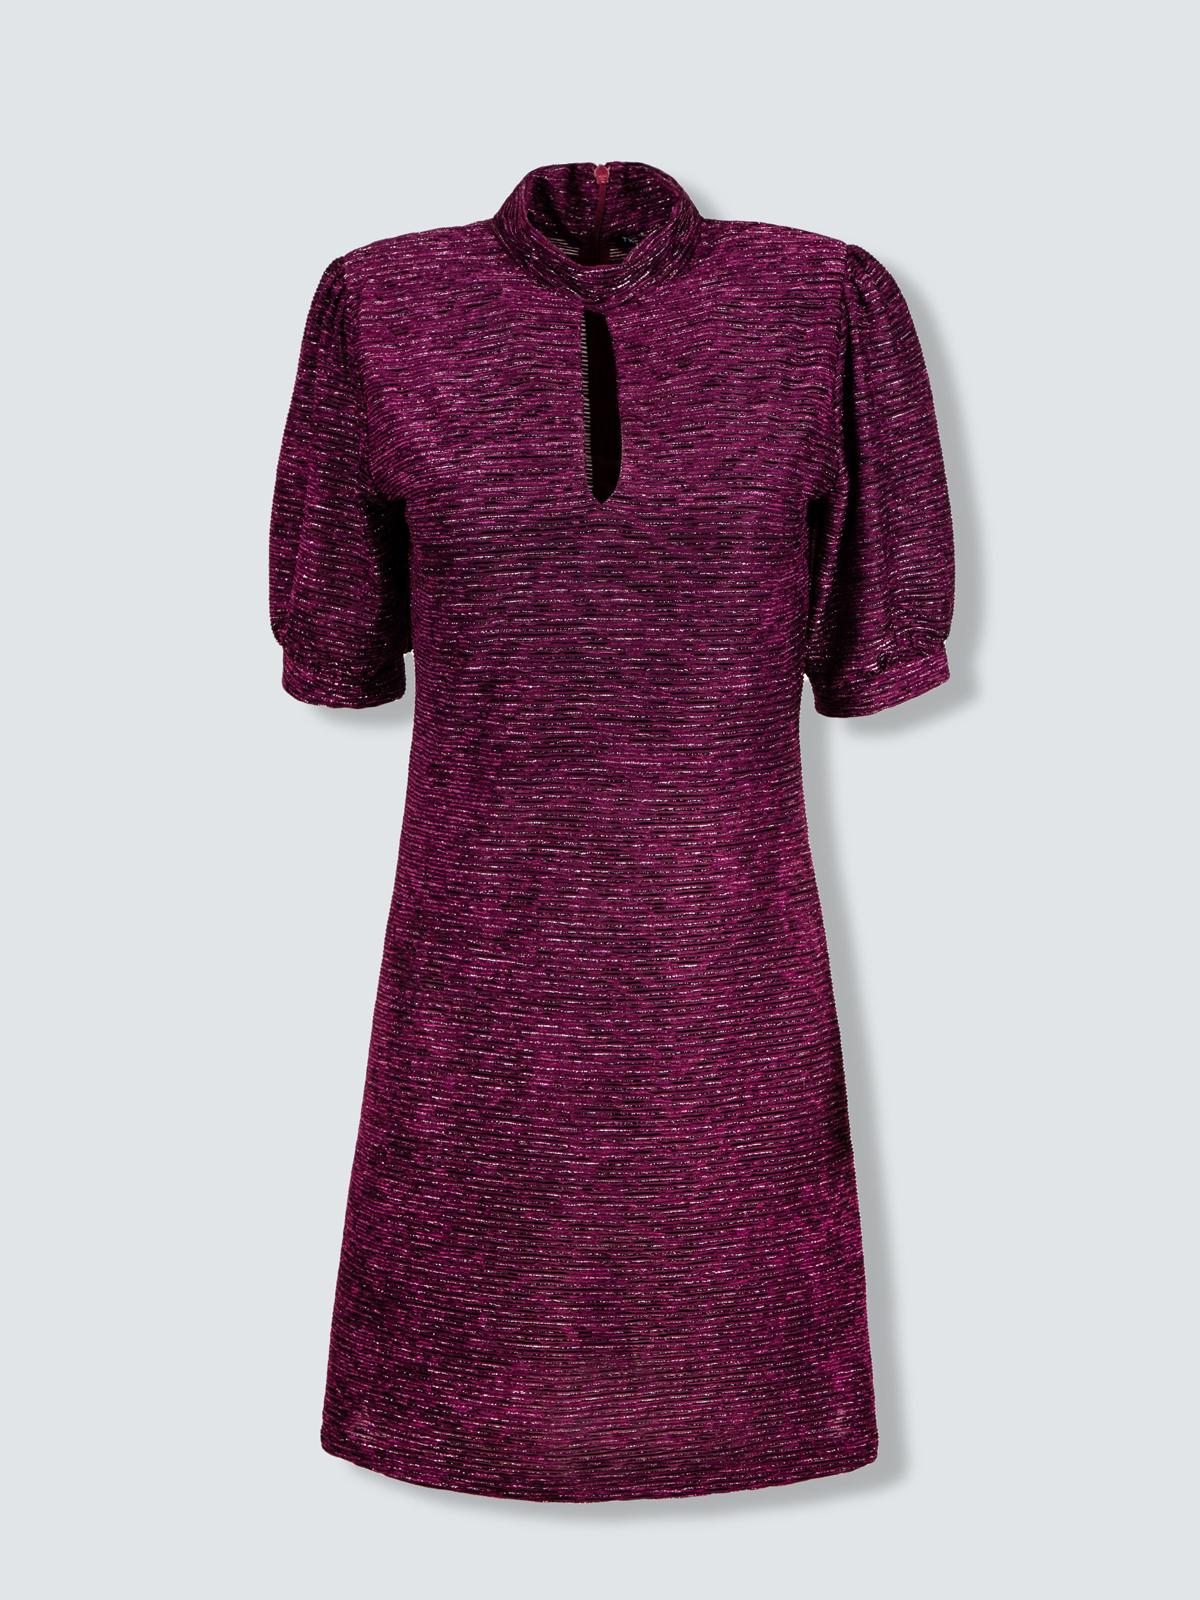 DRESS SHOULDER PAD